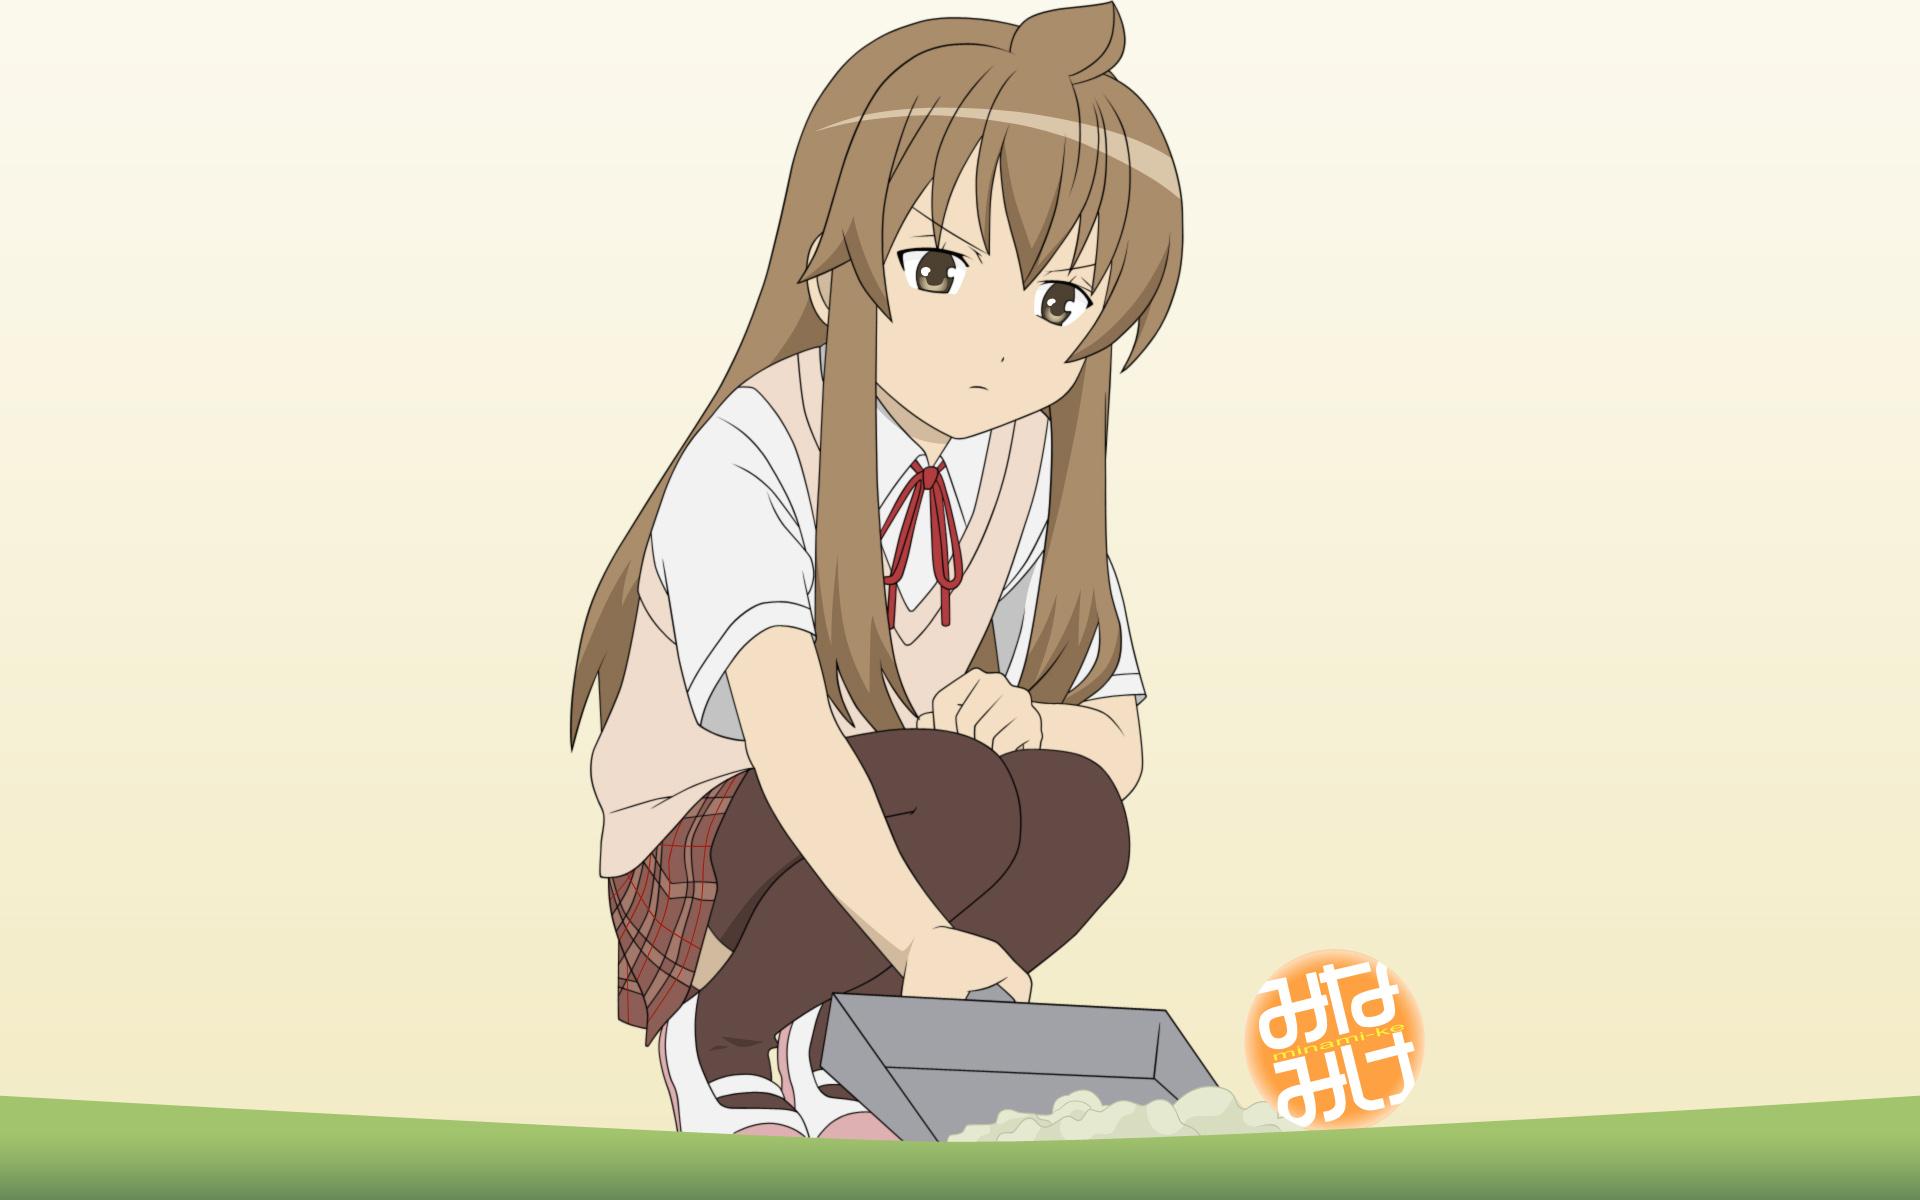 Anime - Minami-ke  Wallpaper